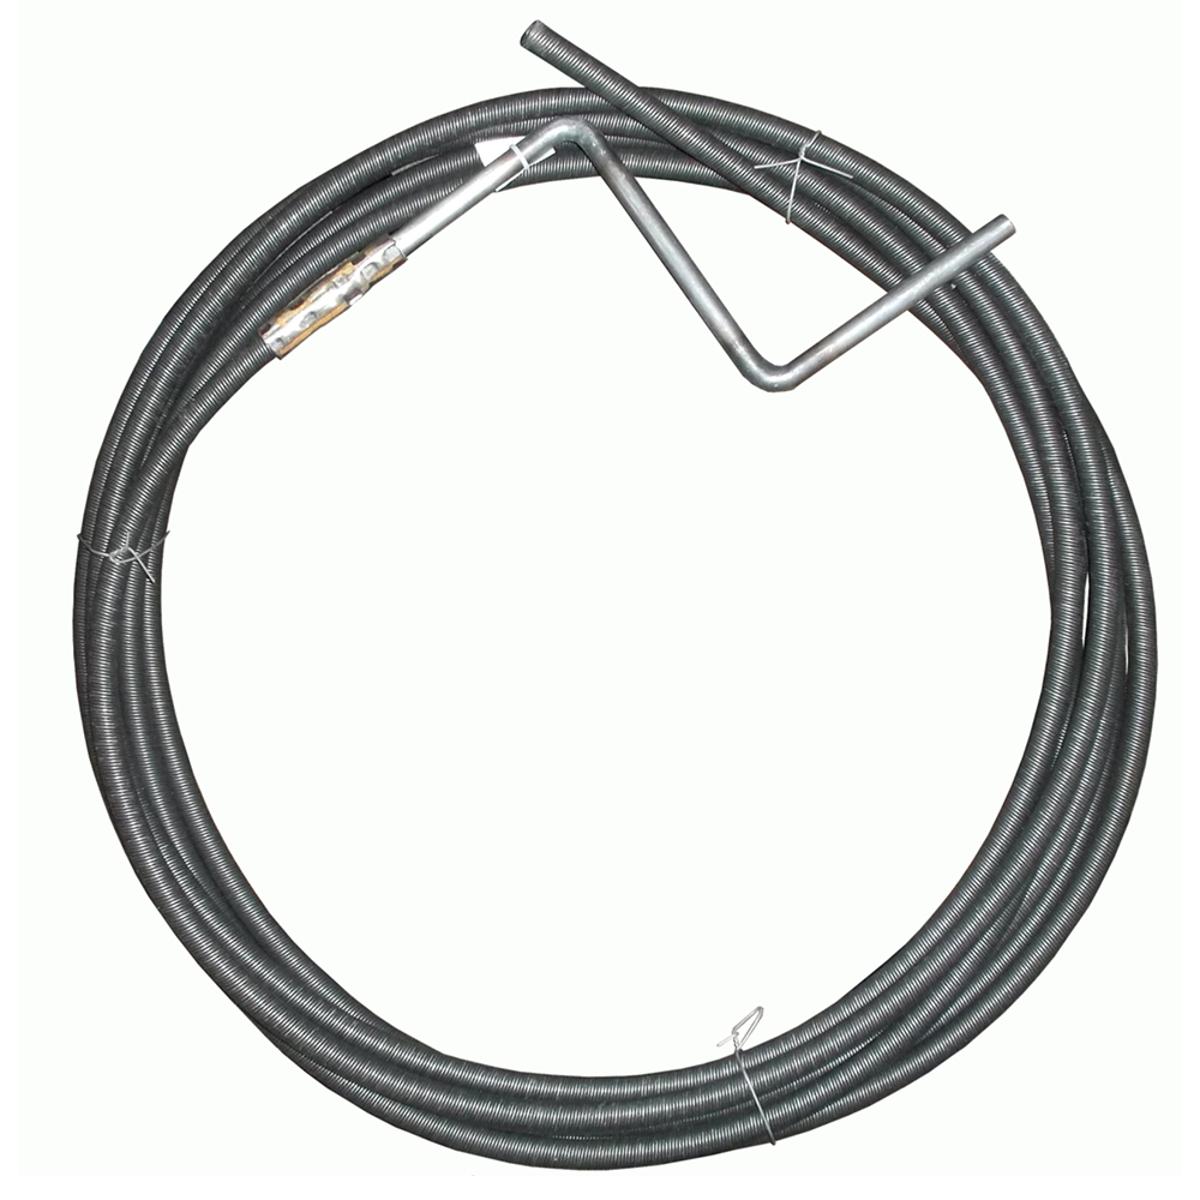 Трос для прочистки канализационных труб Masterprof, пружинный, 5,5 мм х 3 мRG-D31SПружинный трос Masterprof предназначен для прочистки канализационных труб.Диаметр: 5,5 мм.Длина 3 метра.